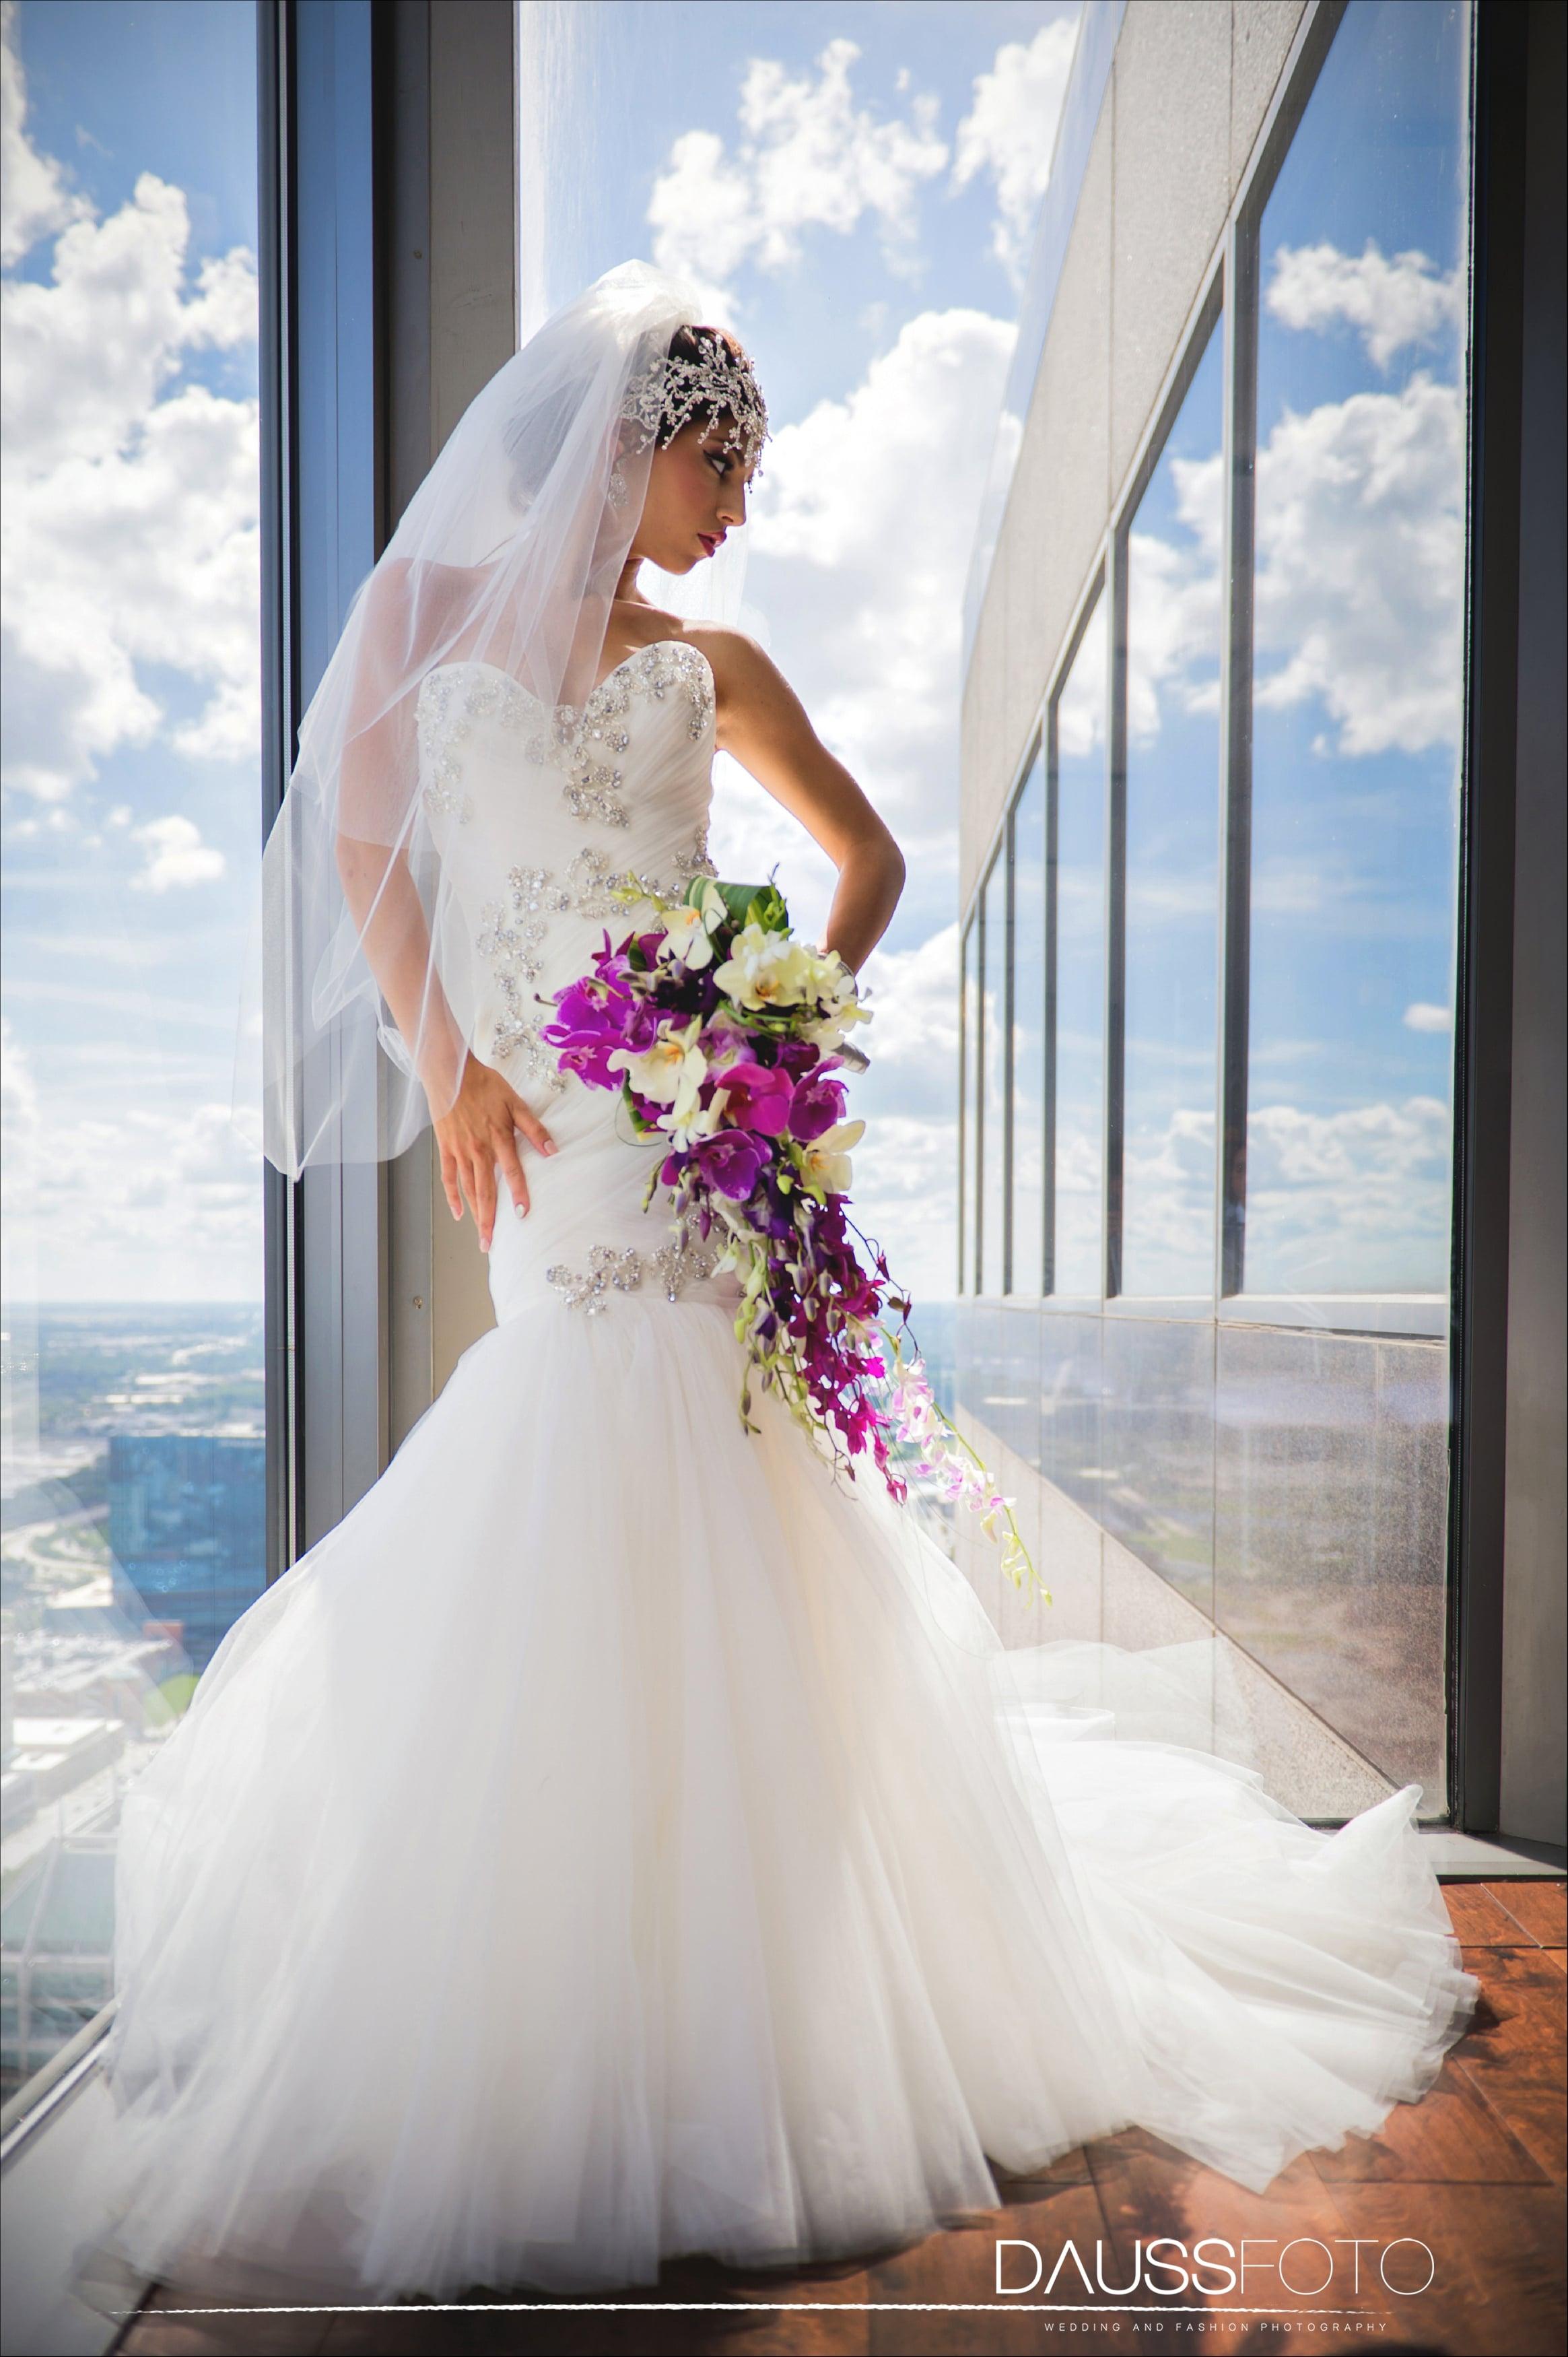 DaussFOTO_20150721_049_Indiana Wedding Photographer.jpg